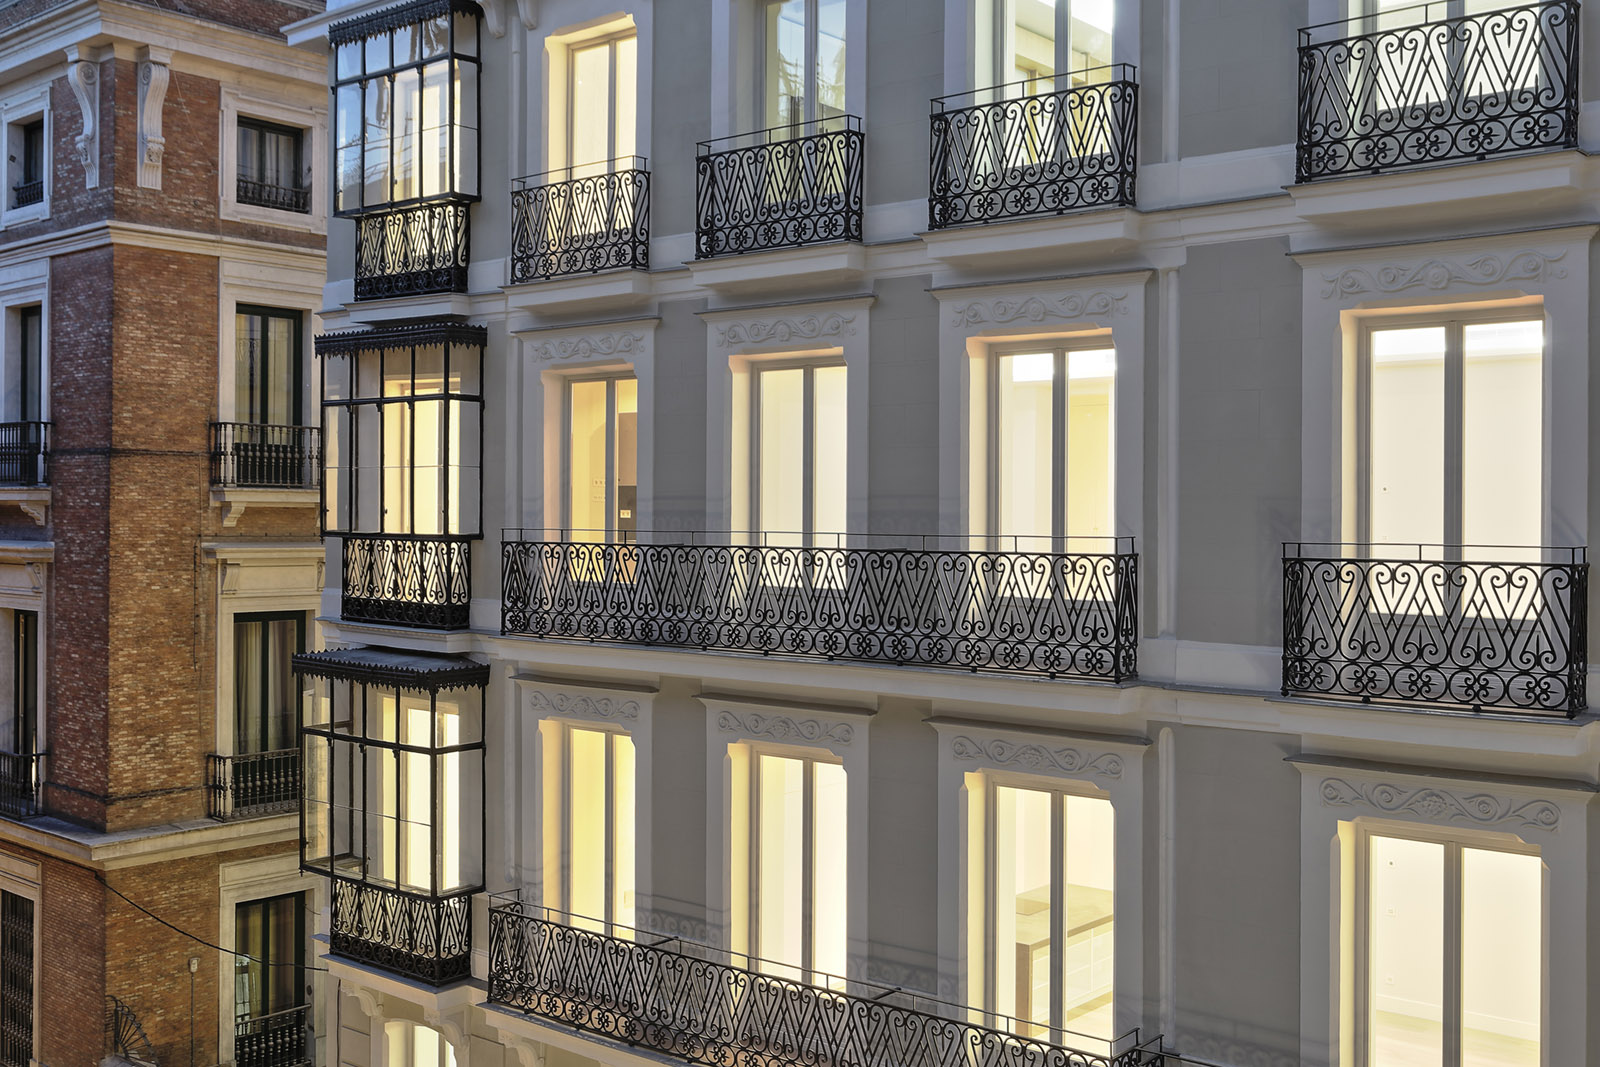 Architectural641-Interior-photographer-Madrid-Spain-.jpg